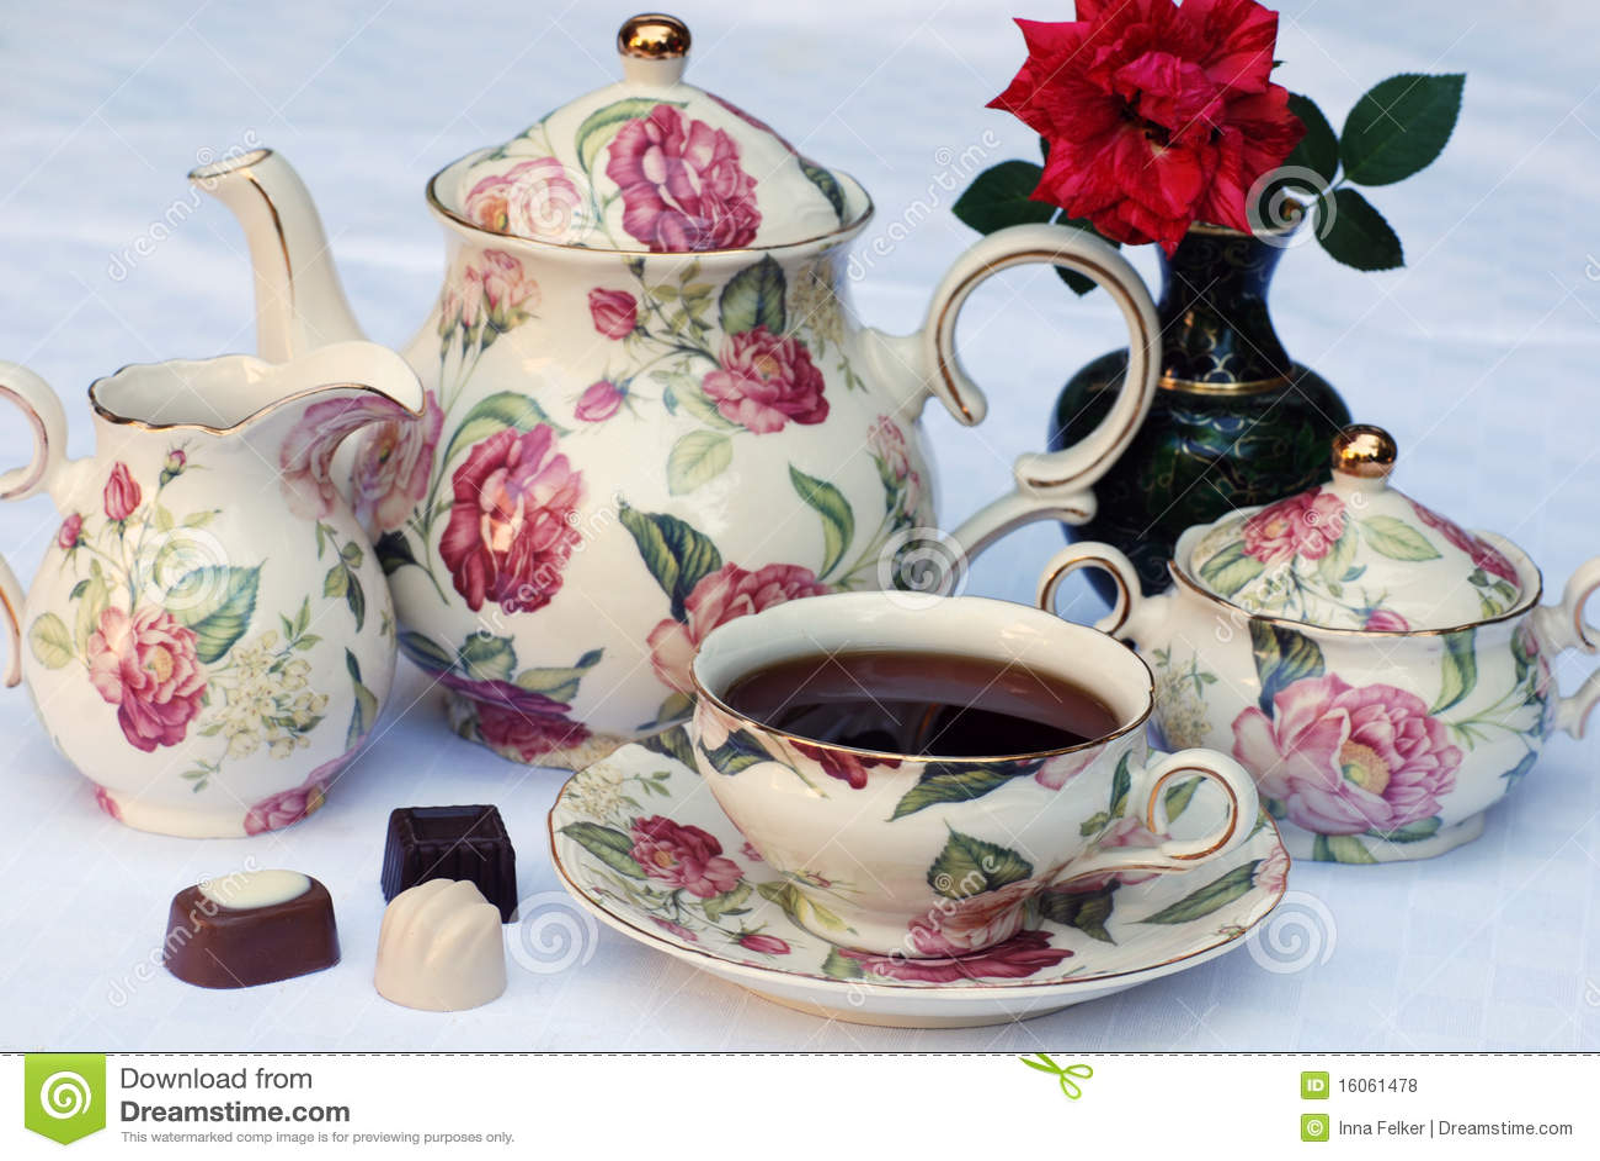 English Tea Royalty Free Stock Photos Image 16061478